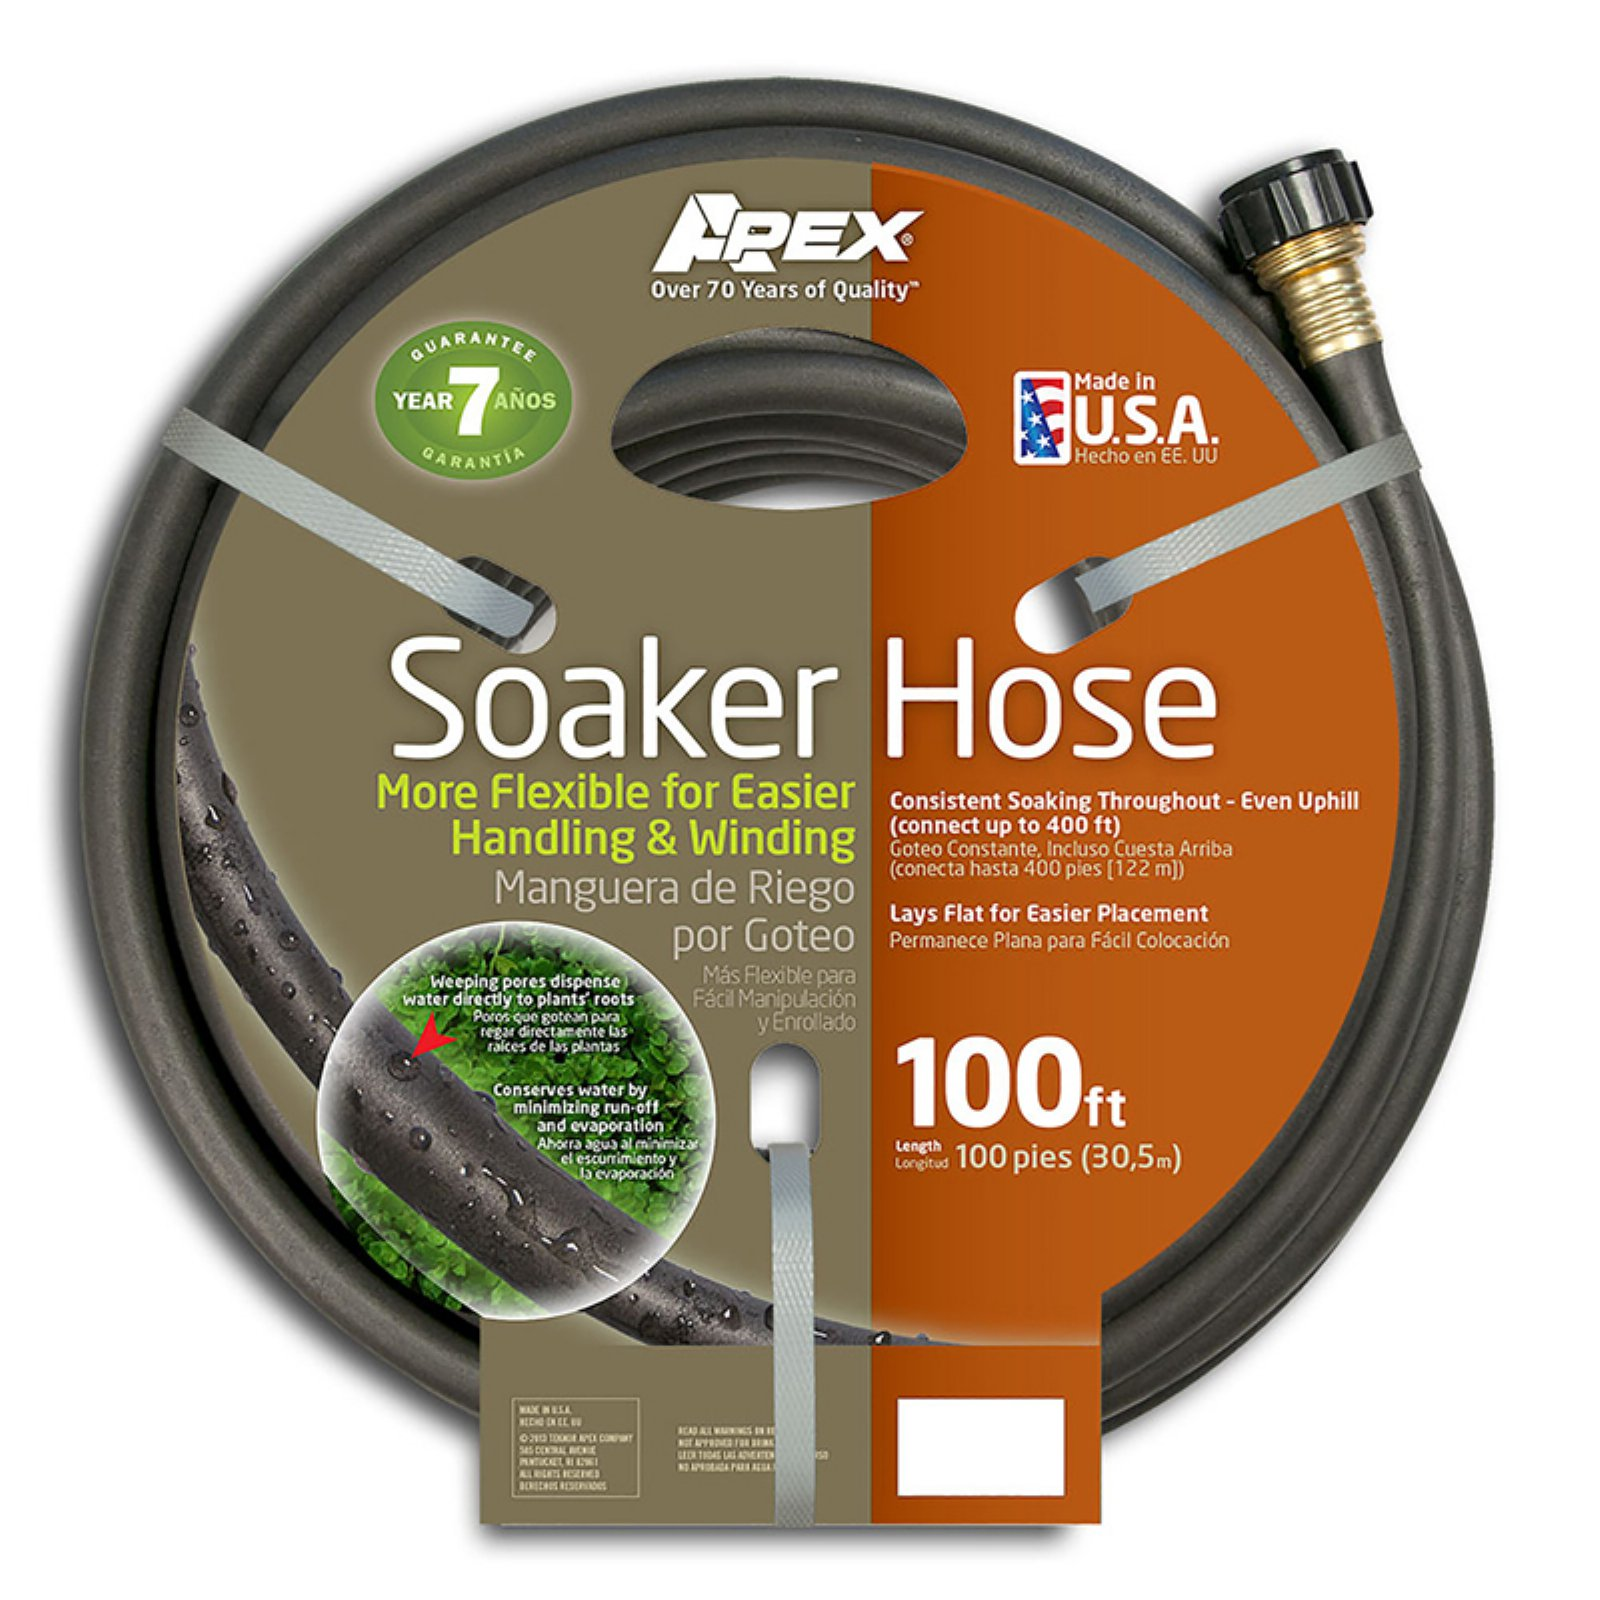 Apex 1030 Soil Soaker